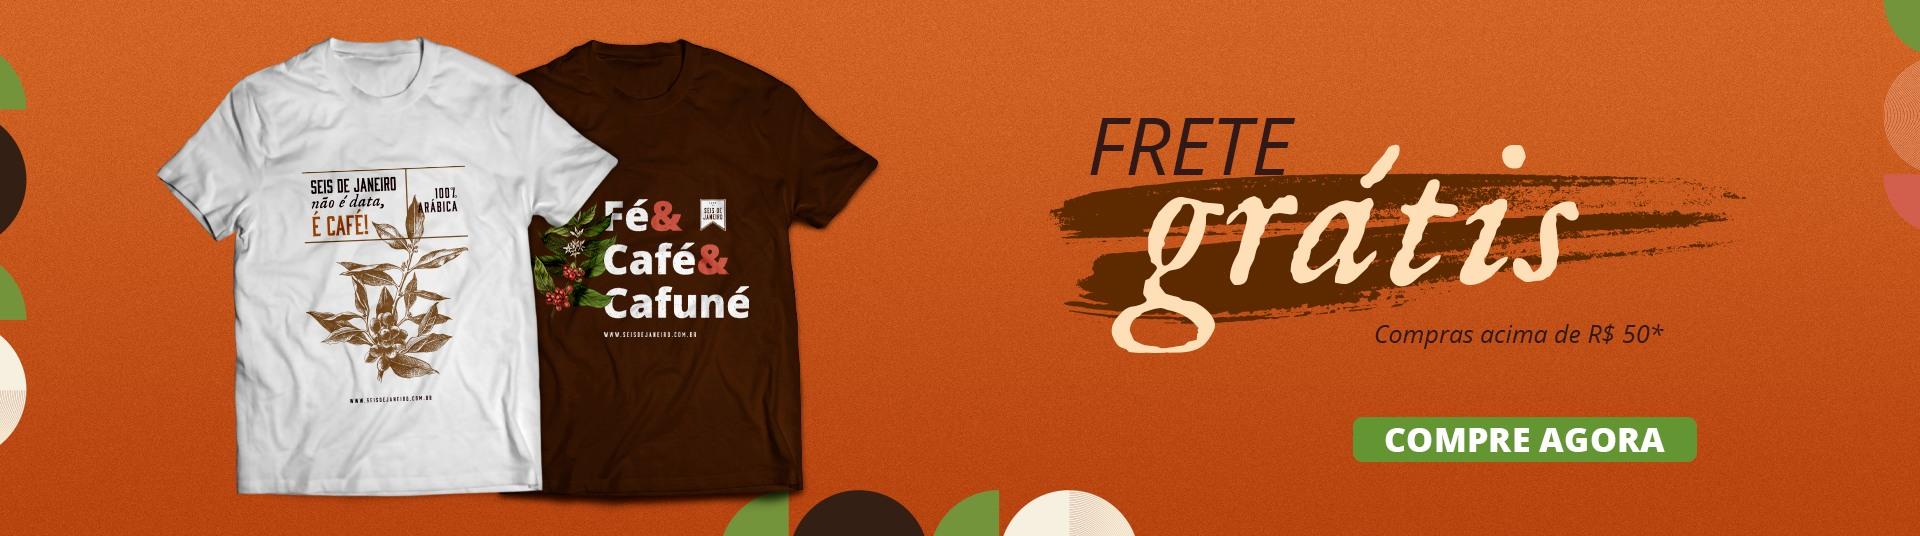 full banner produto/camisetas